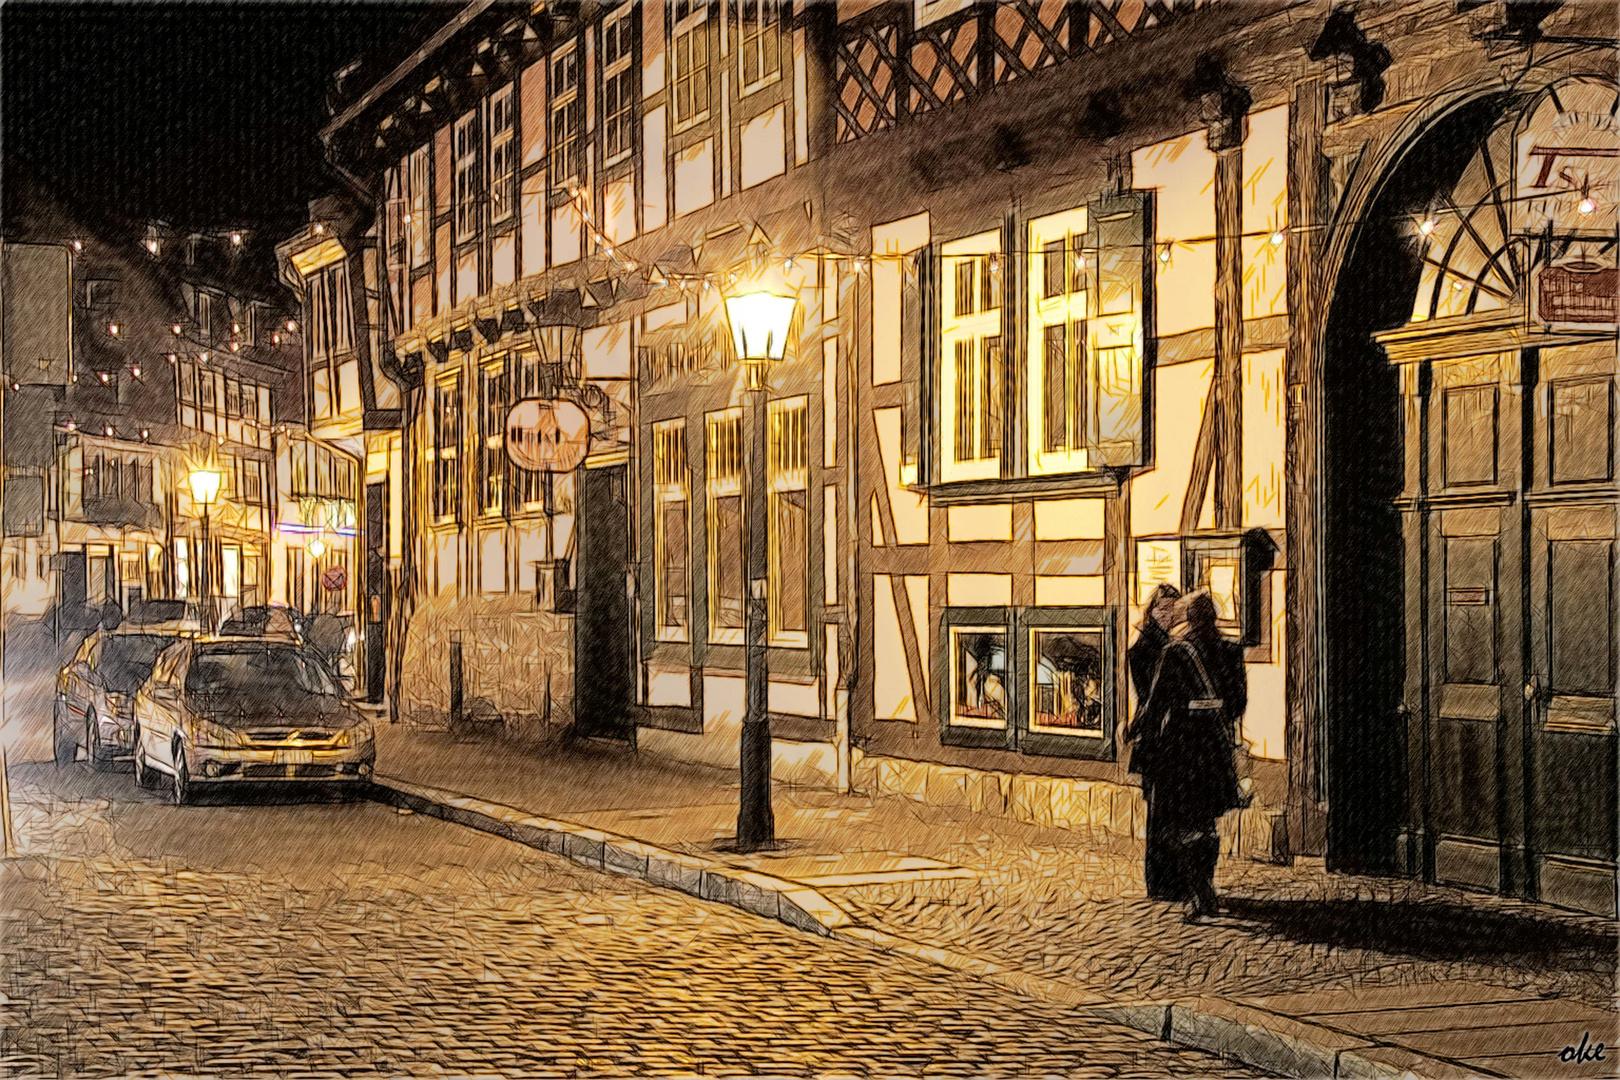 Kleinstadtromantik